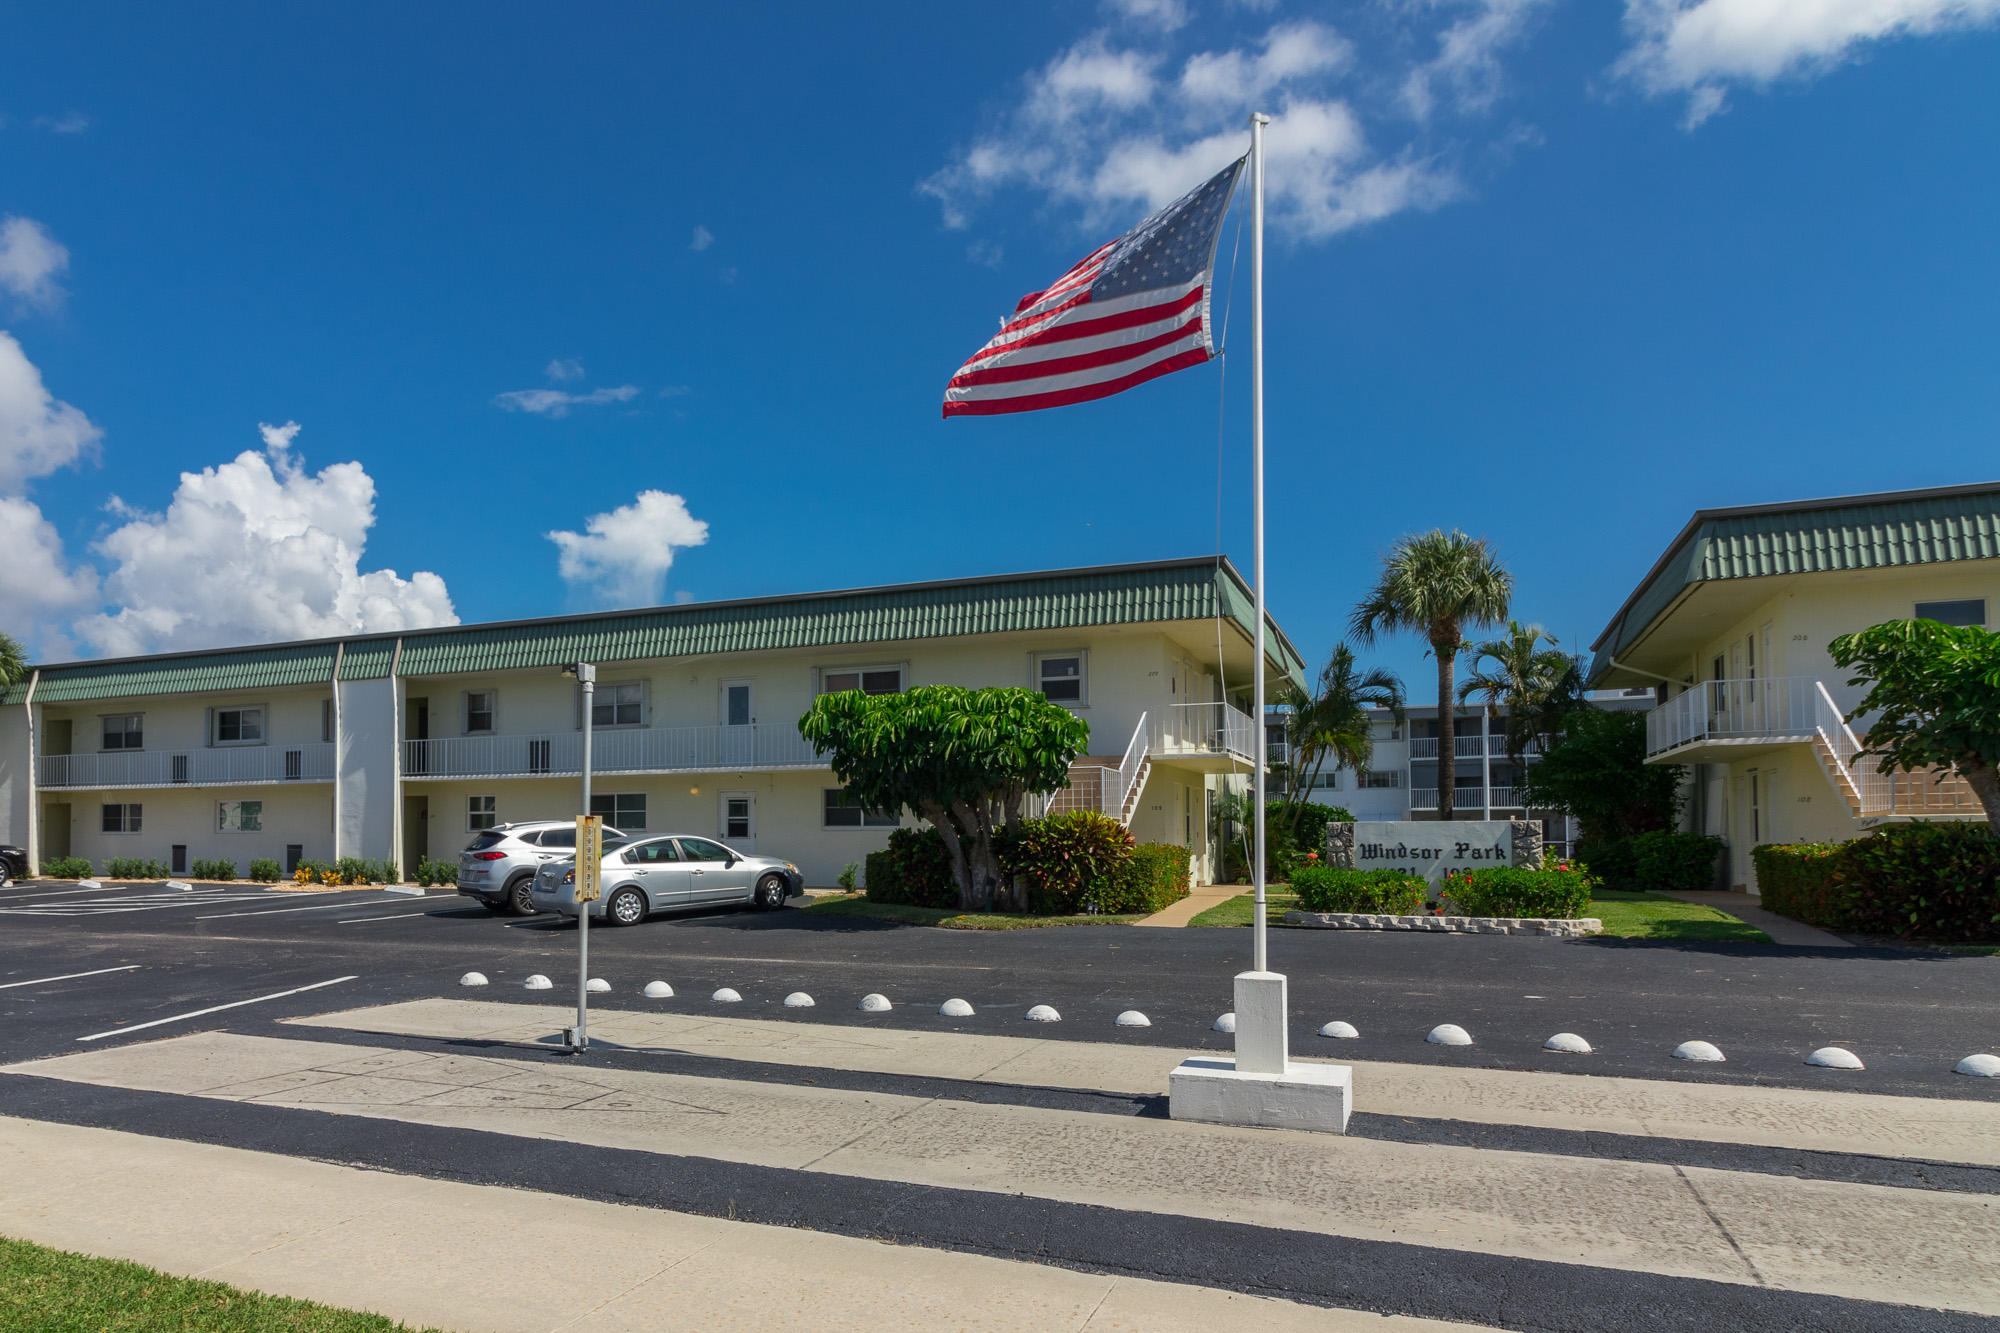 121 Wettaw Lane 111, North Palm Beach, Florida 33408, 2 Bedrooms Bedrooms, ,2 BathroomsBathrooms,F,Condominium,Wettaw,RX-10544751